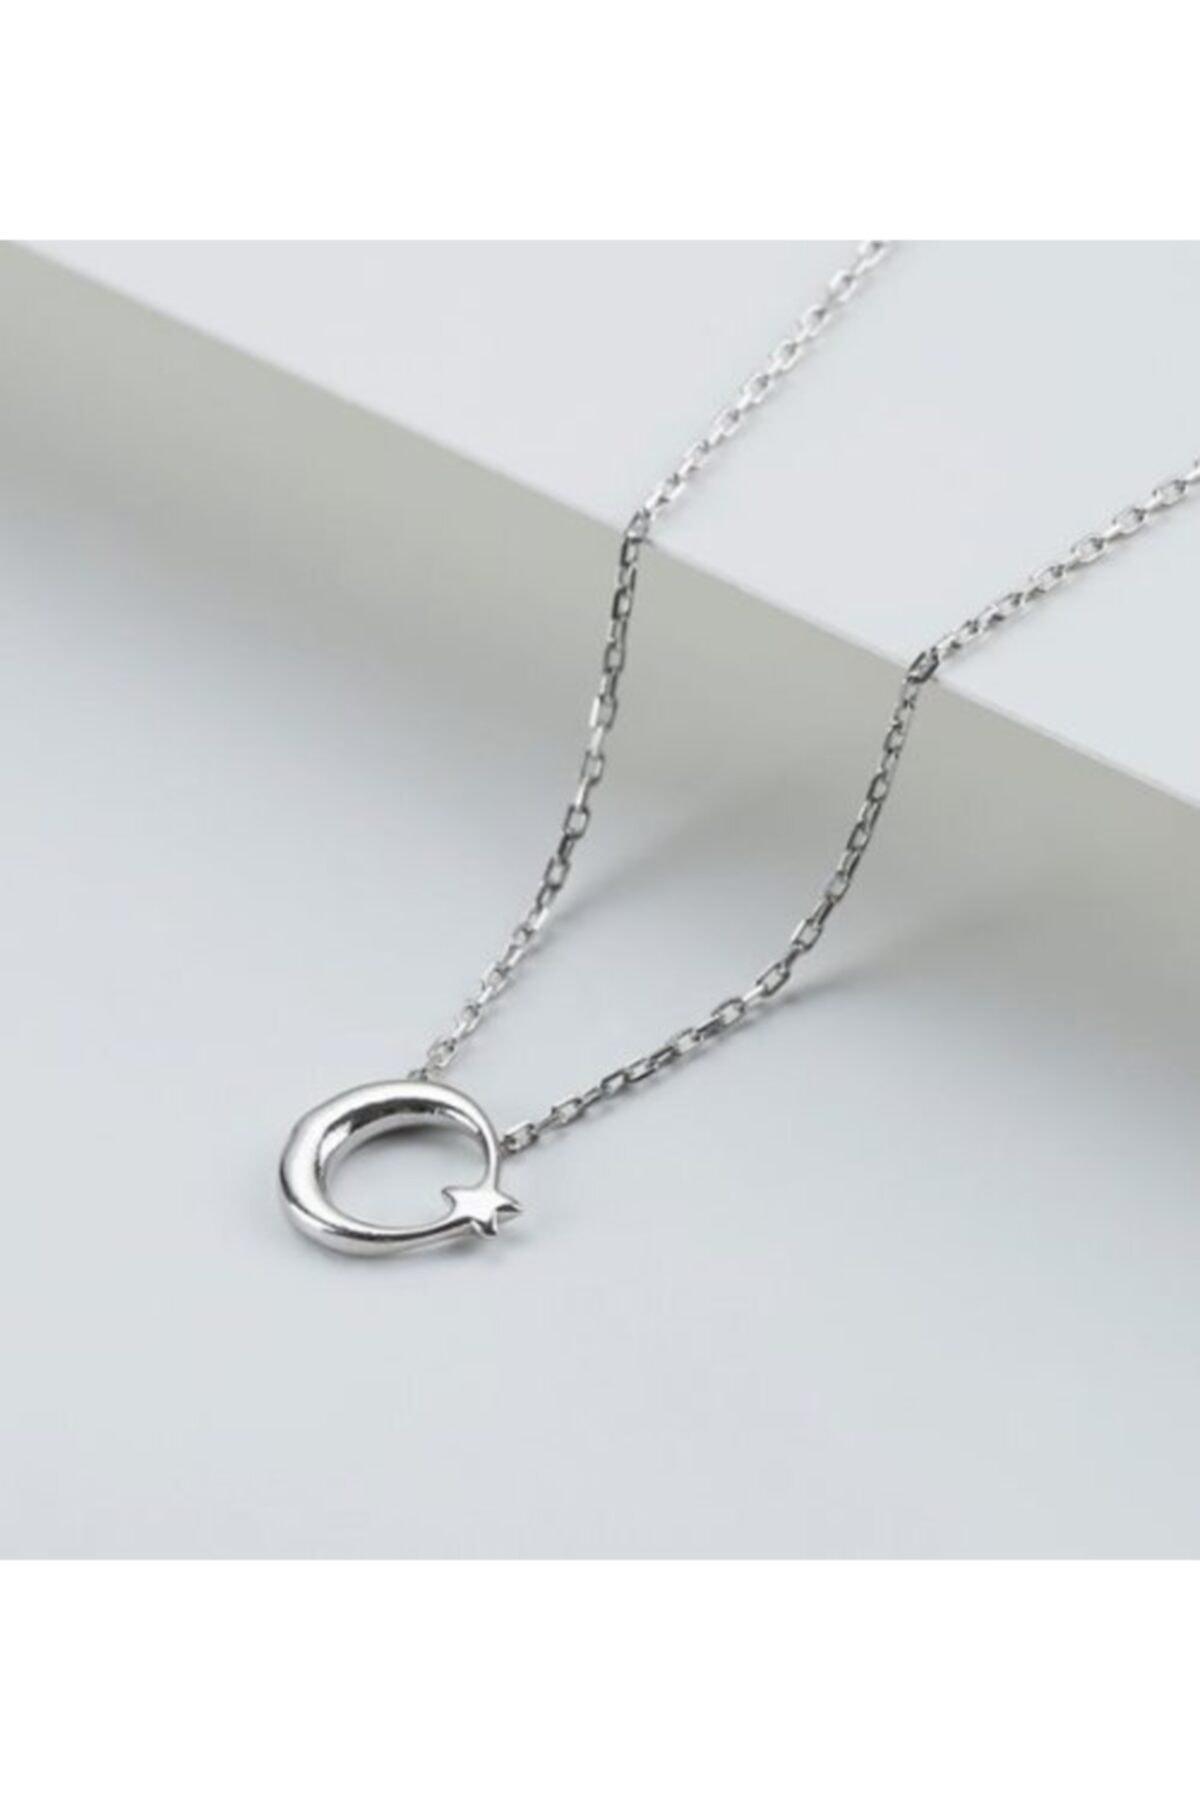 Gümüşistan 925 Ayar Gümüş Minimal Ay Yıldız Kolye 1